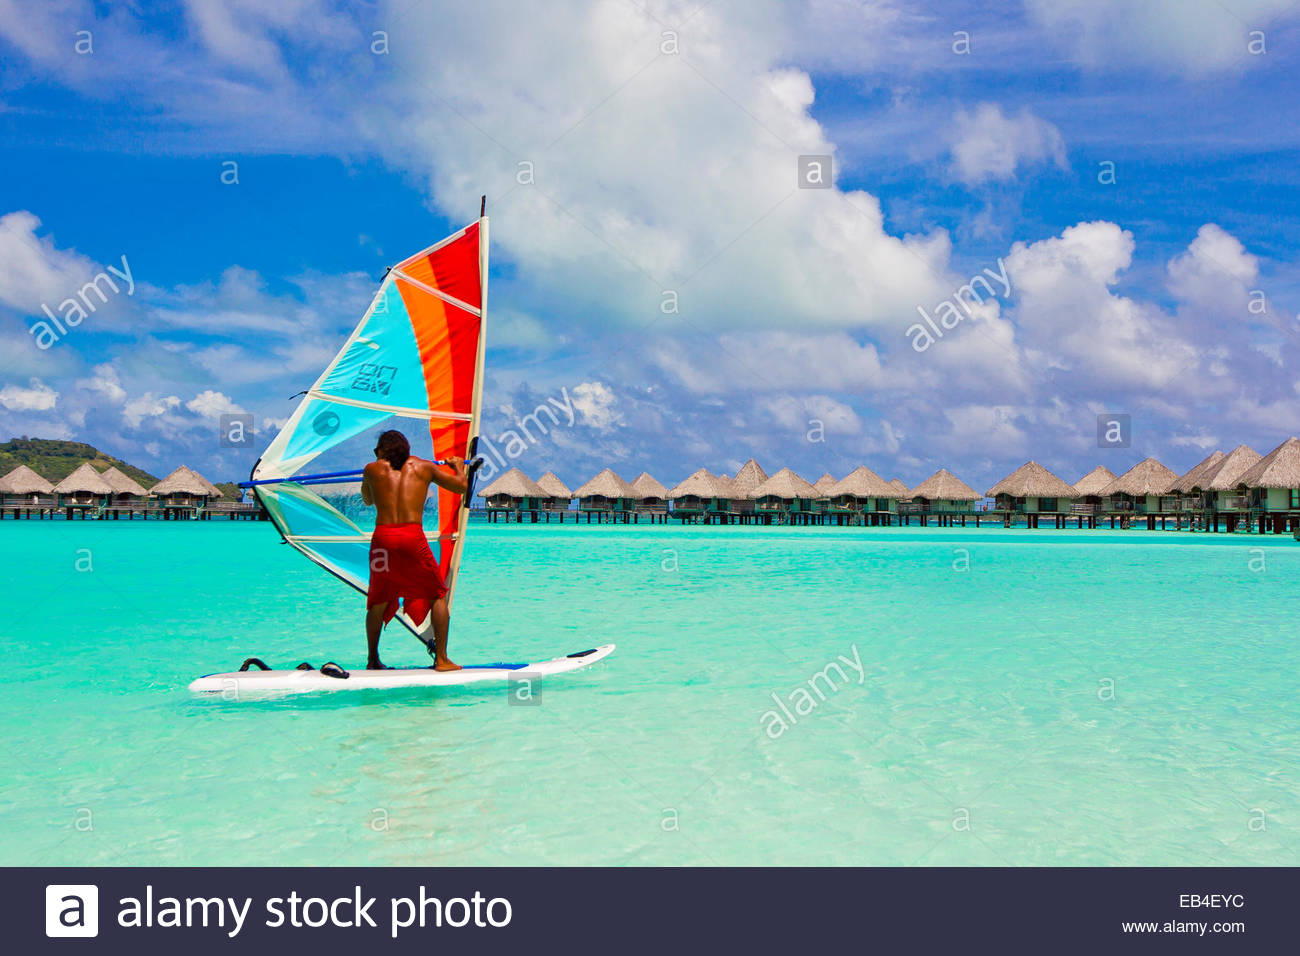 A tourist wind surfing off the coast of Bora Bora. - Stock Image